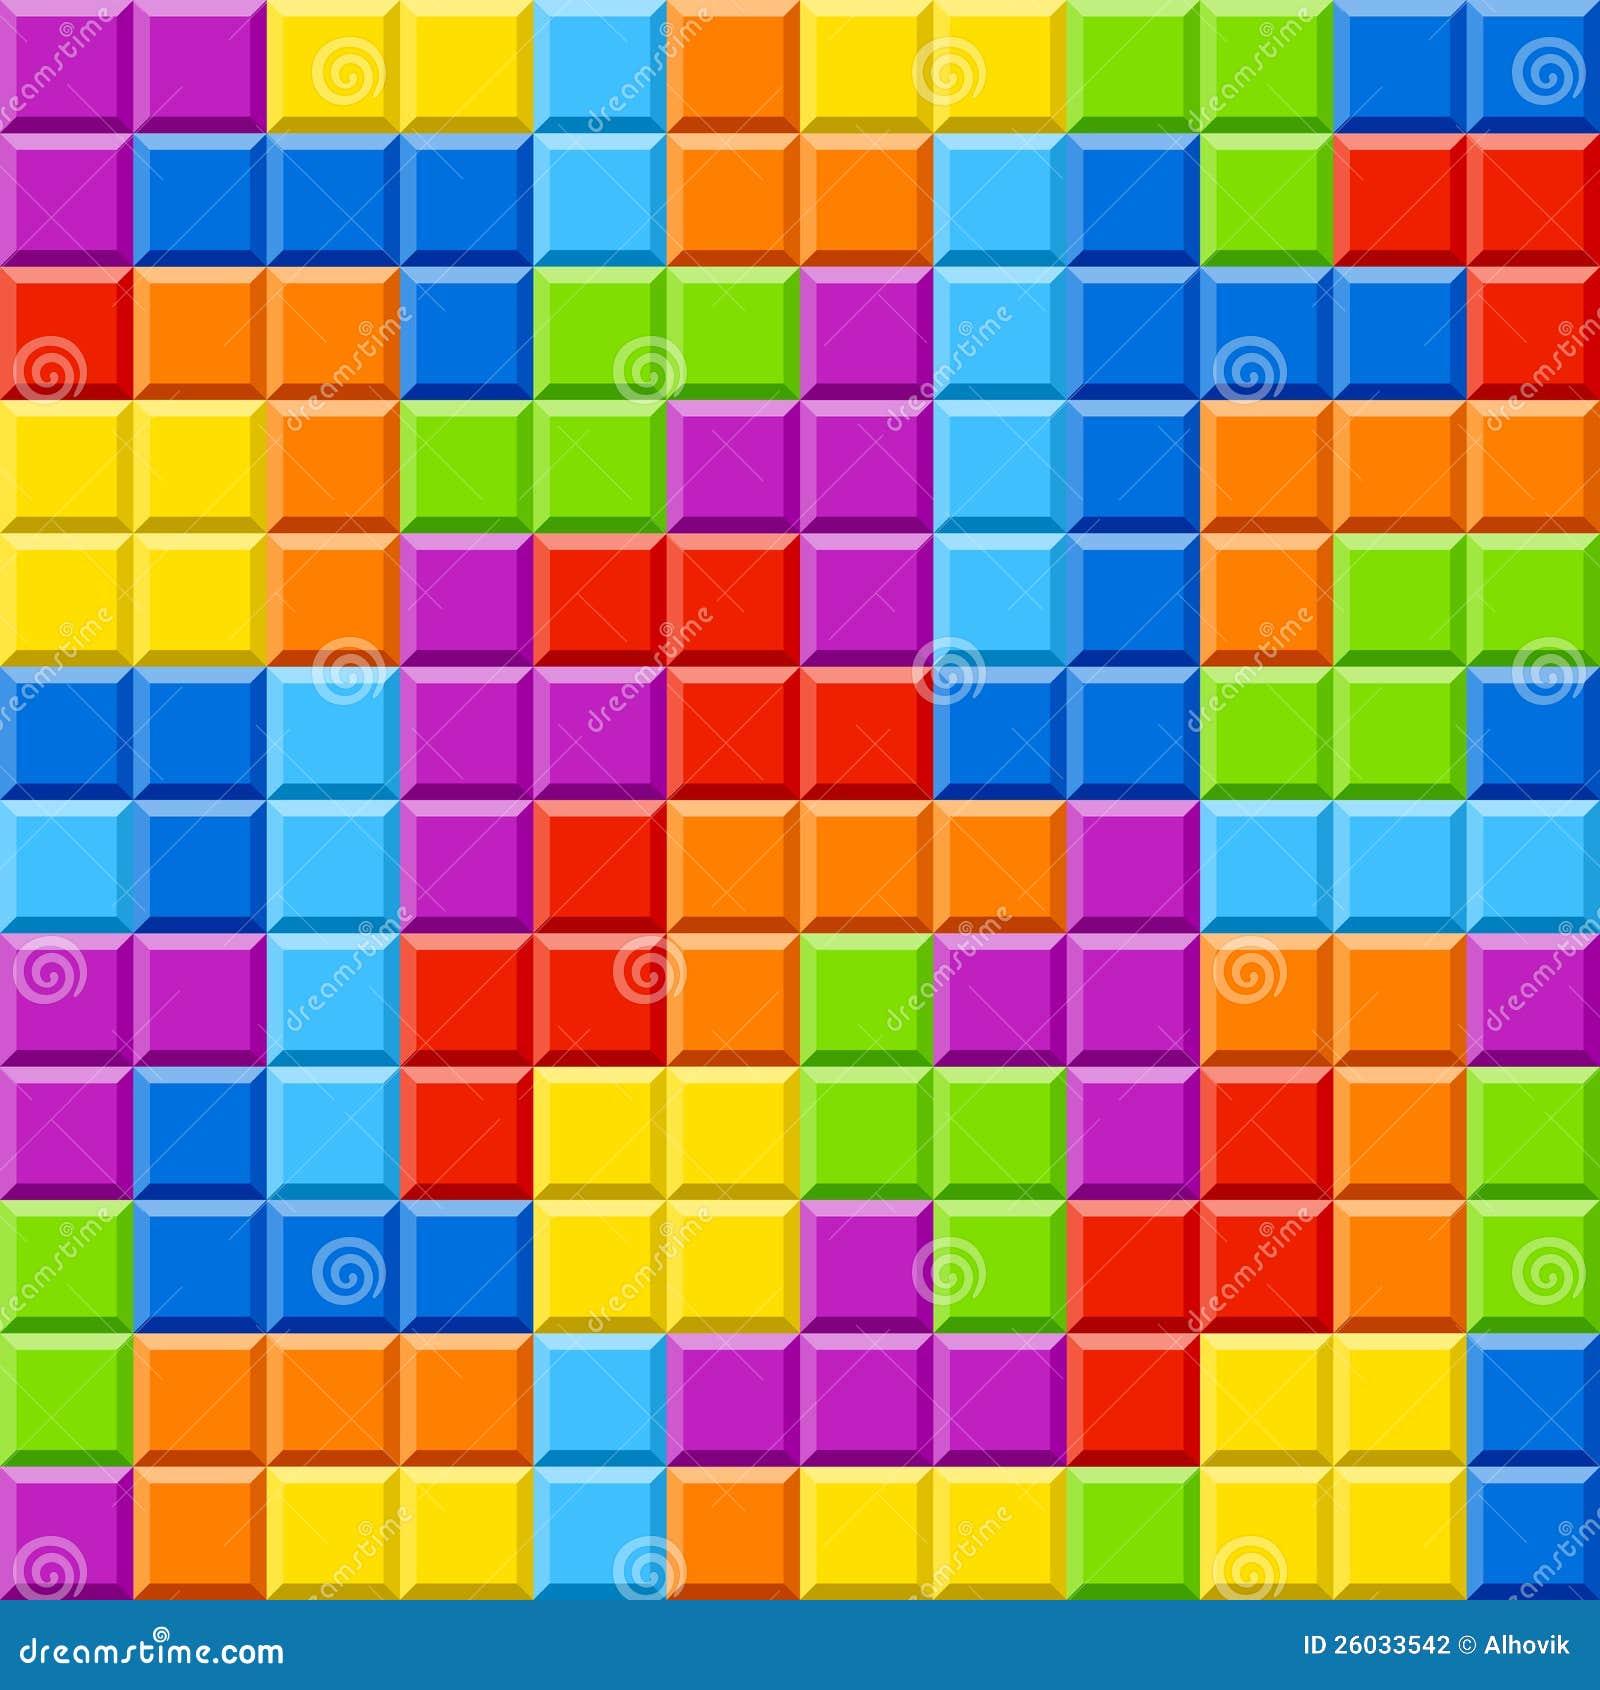 colored blocks wallpaper trololo - photo #21